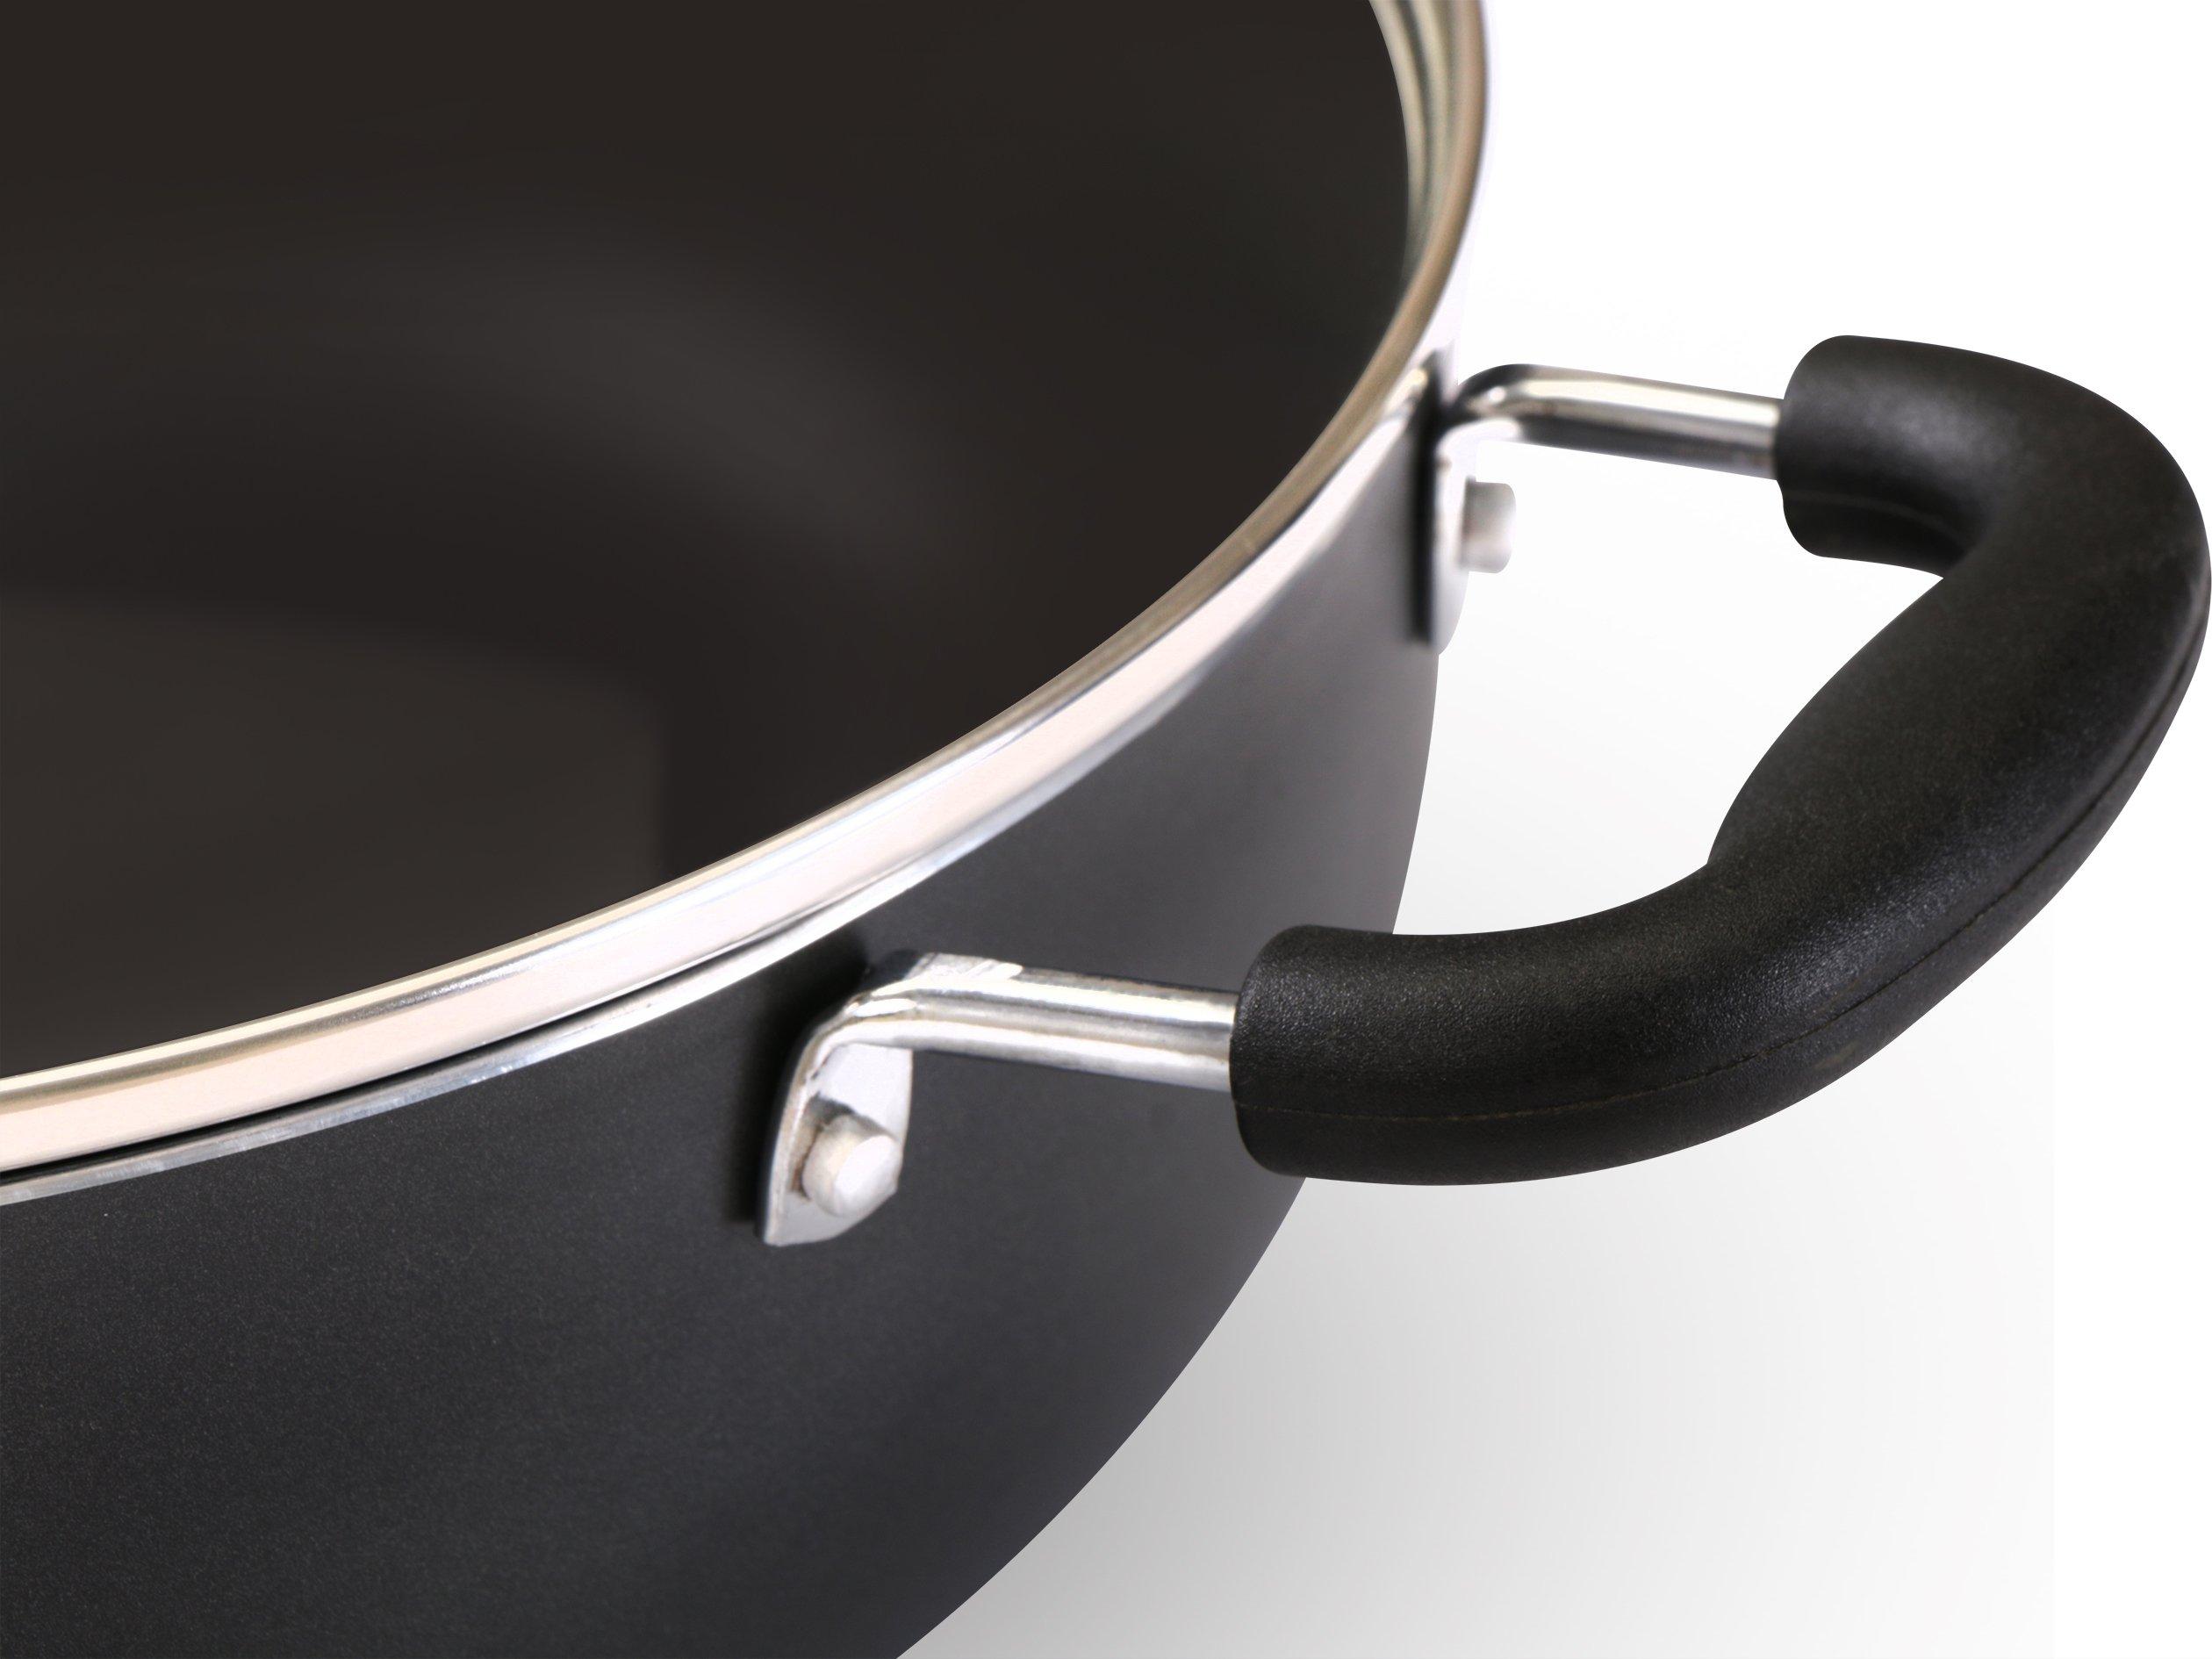 Utopia Kitchen - 11 Inch Nonstick Deep Frying Pan - 4.6 Quart Sauté Pan - Aluminum Jumbo Cooker with Glass Lid - Dishwasher Safe by Utopia Kitchen (Image #7)